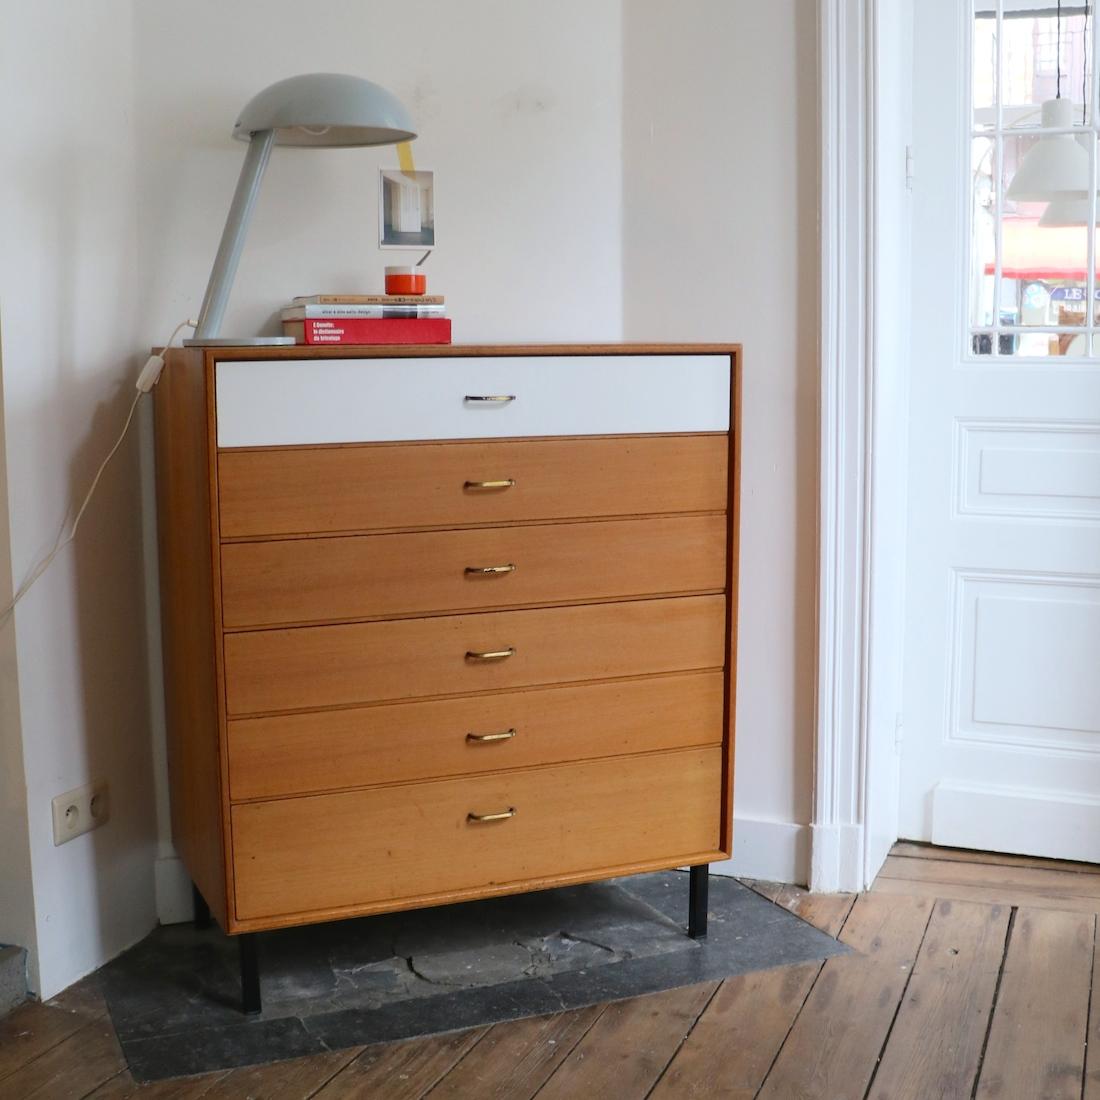 commode 6 tiroirs la maison bruxelloise. Black Bedroom Furniture Sets. Home Design Ideas